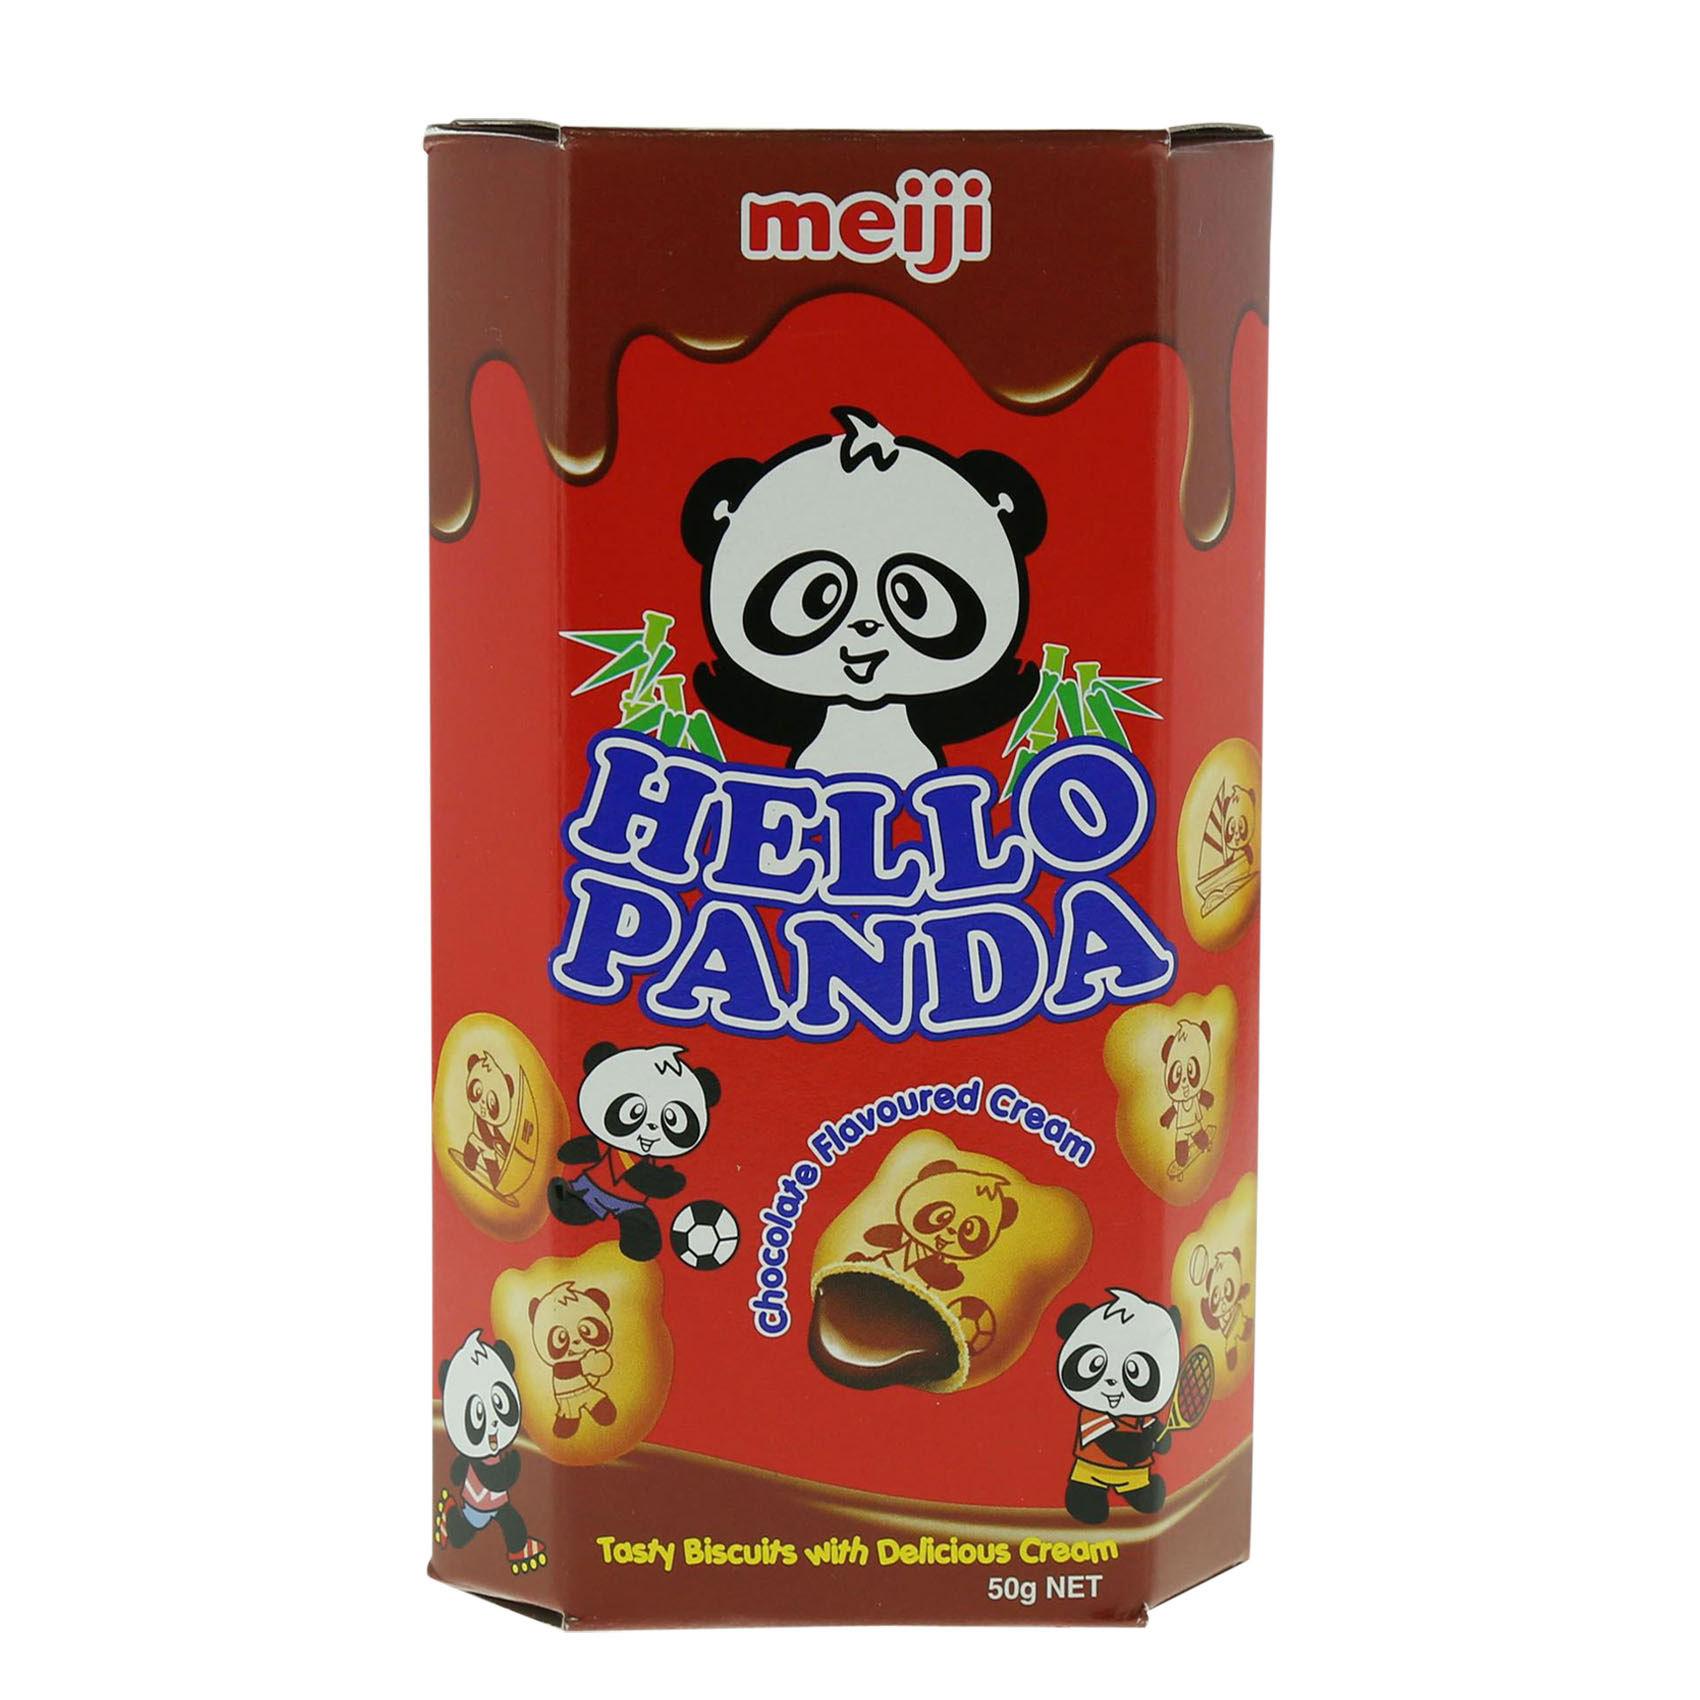 HELLO PANDA 50G